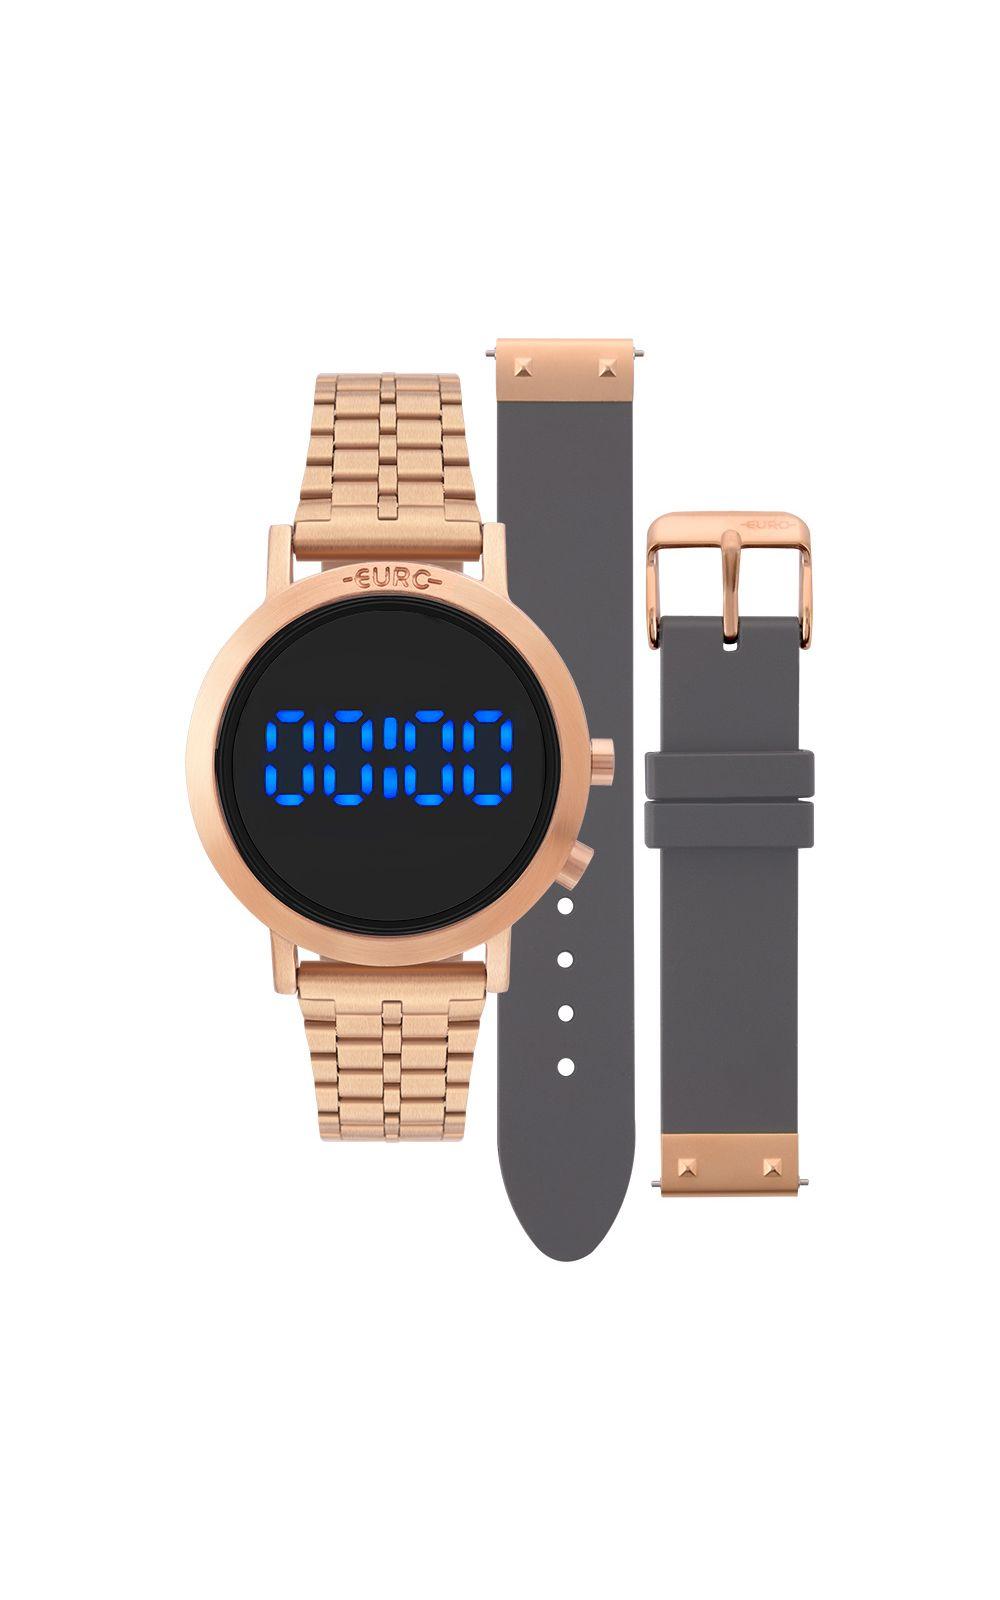 e9b9fd50b734a Relógio Euro Feminino Fashion Fit Rosé - EUBJ3407AC T4F   Opte+